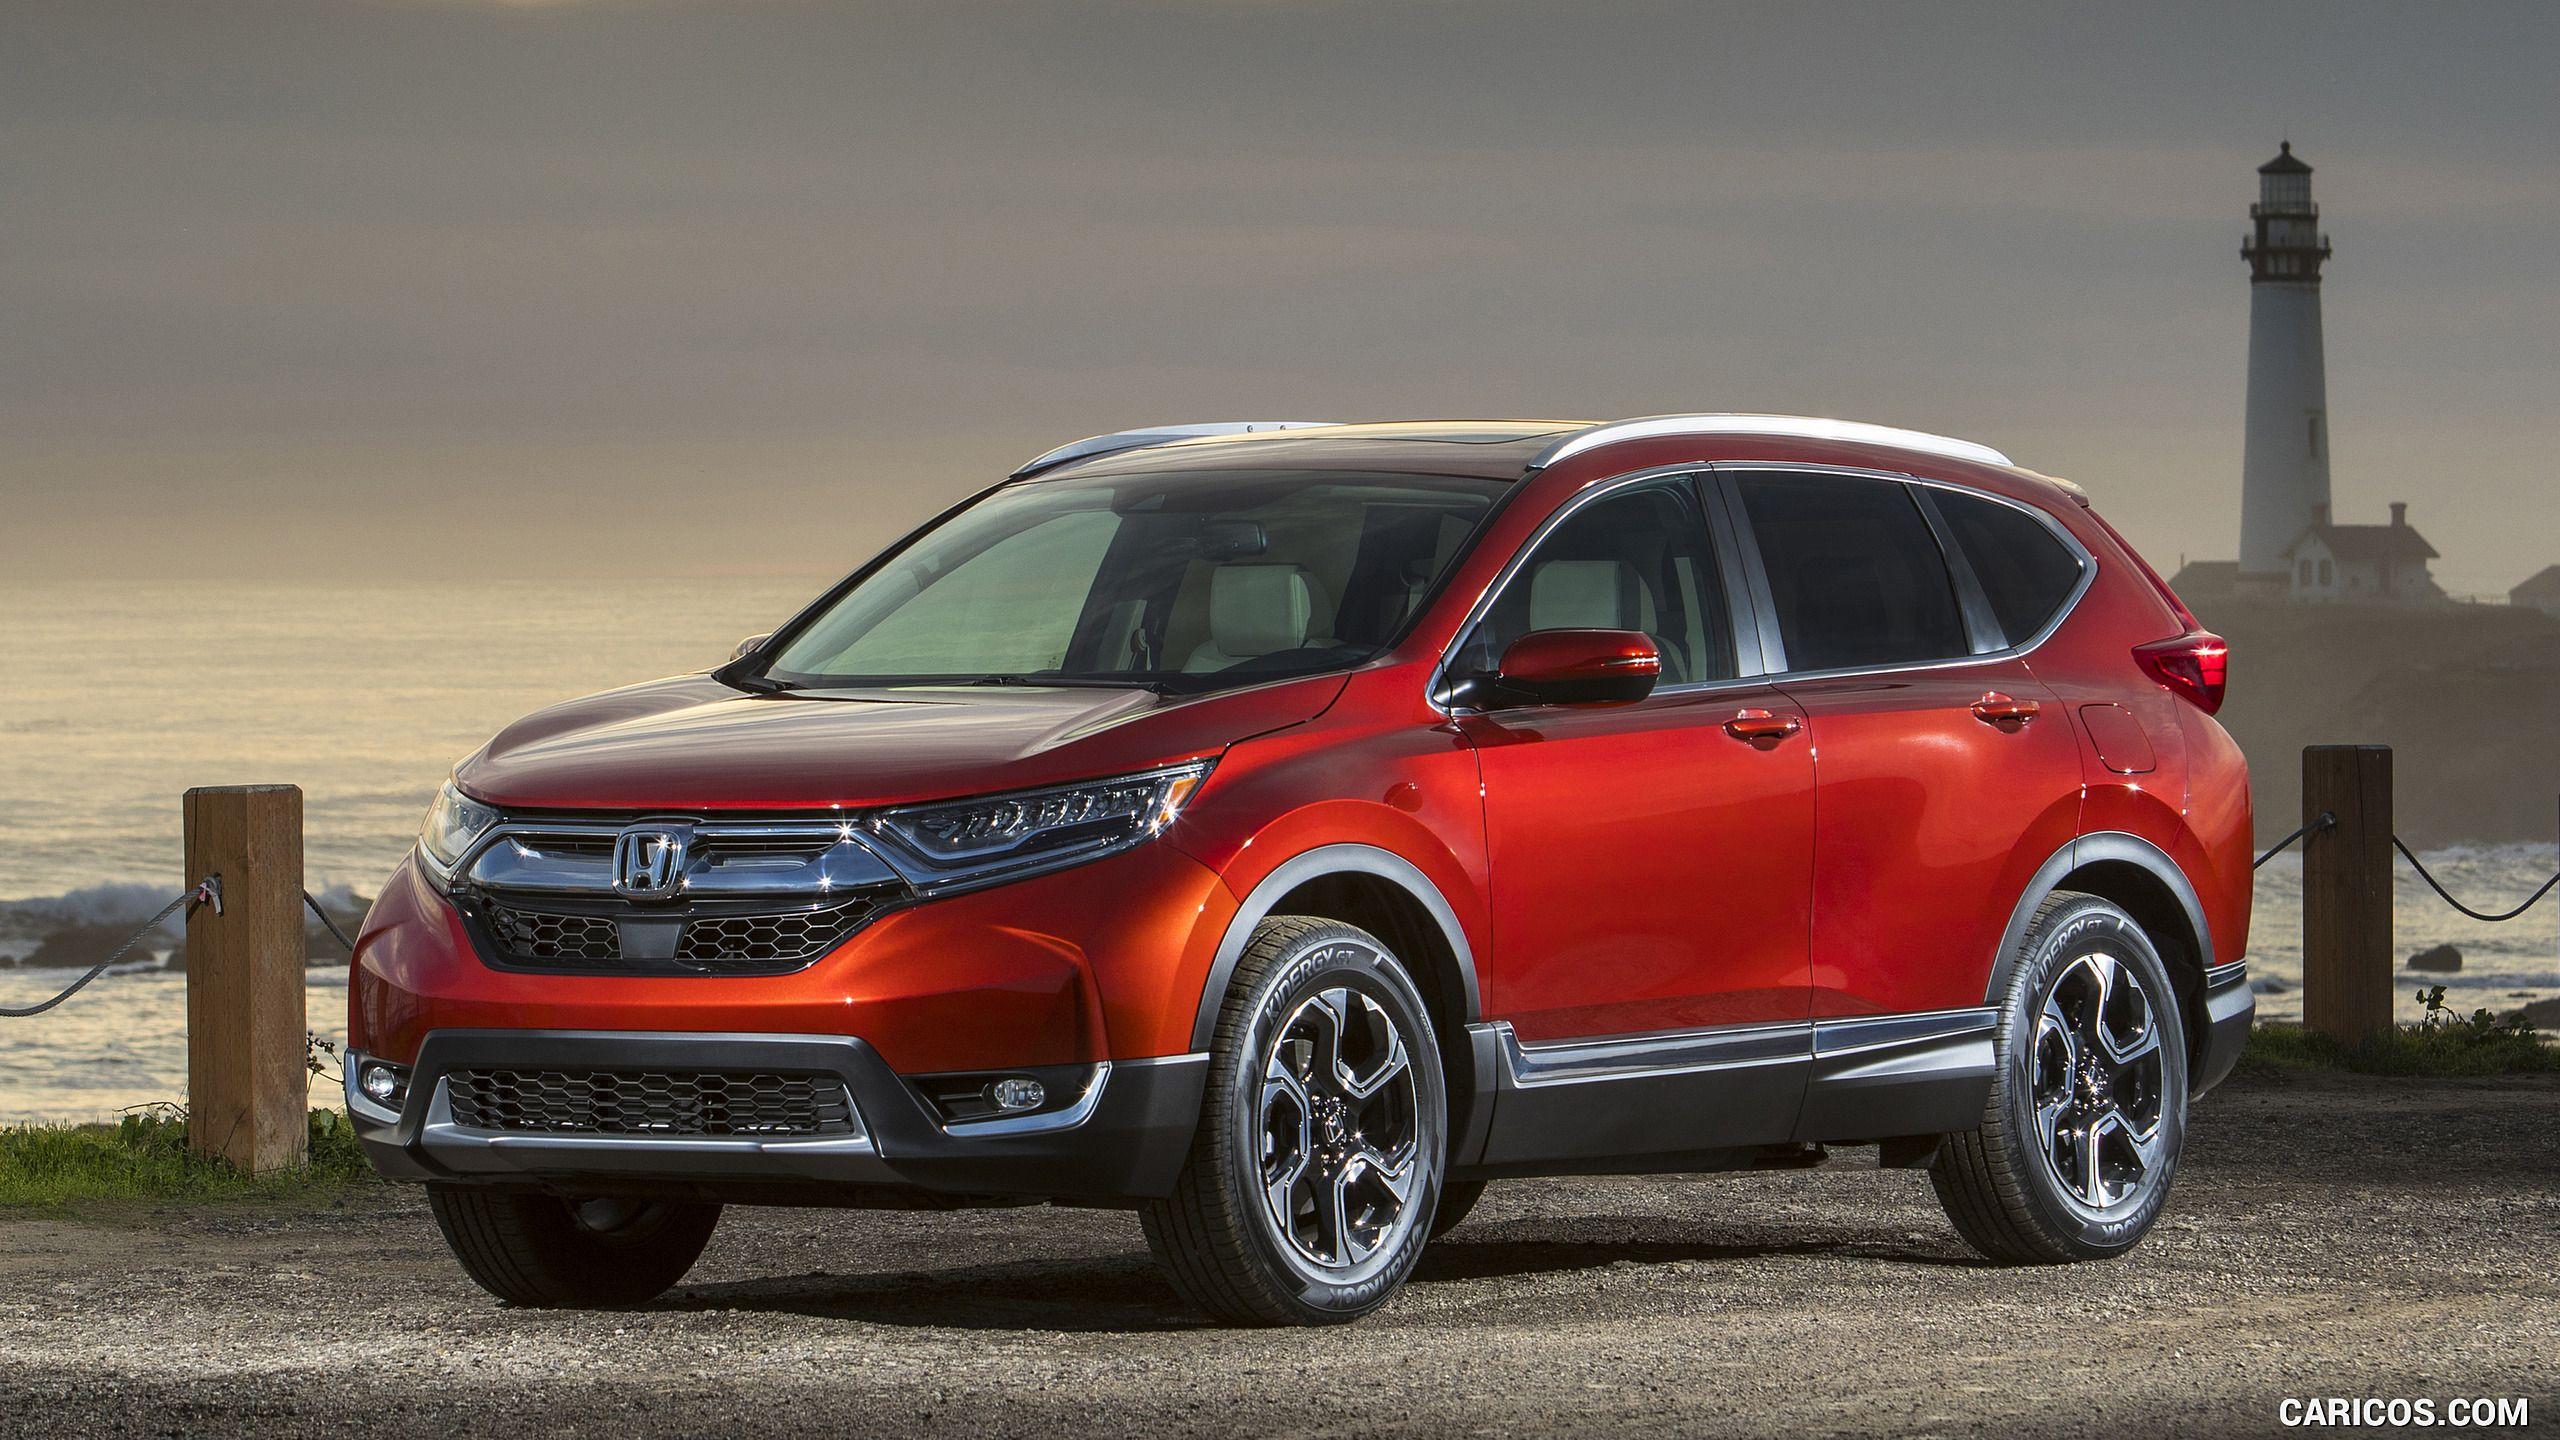 2017 Honda CRV Wallpaper Auto